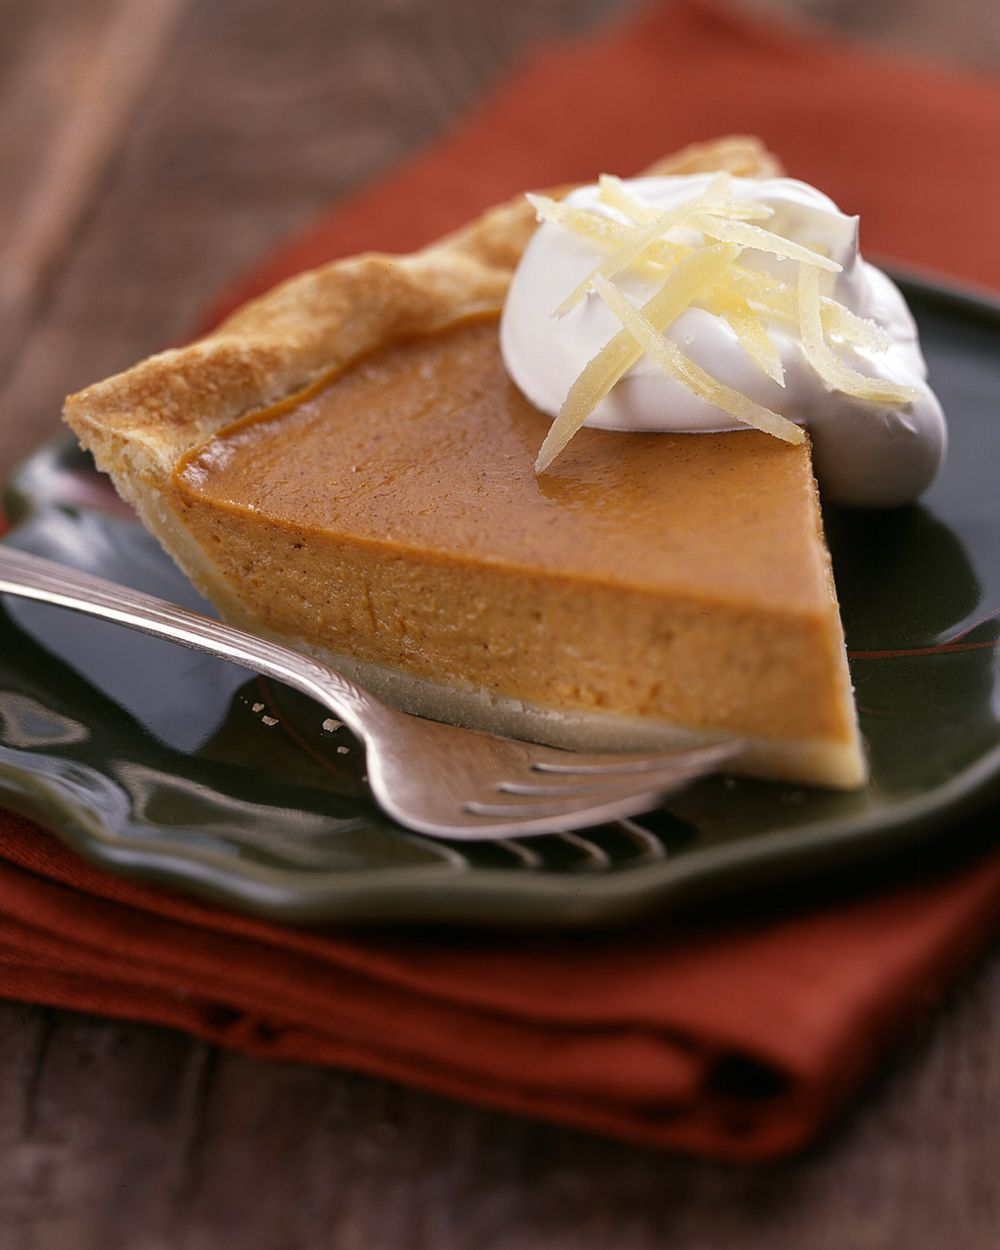 pumkin-pie-slice-food-stylist-san-francisco.jpg